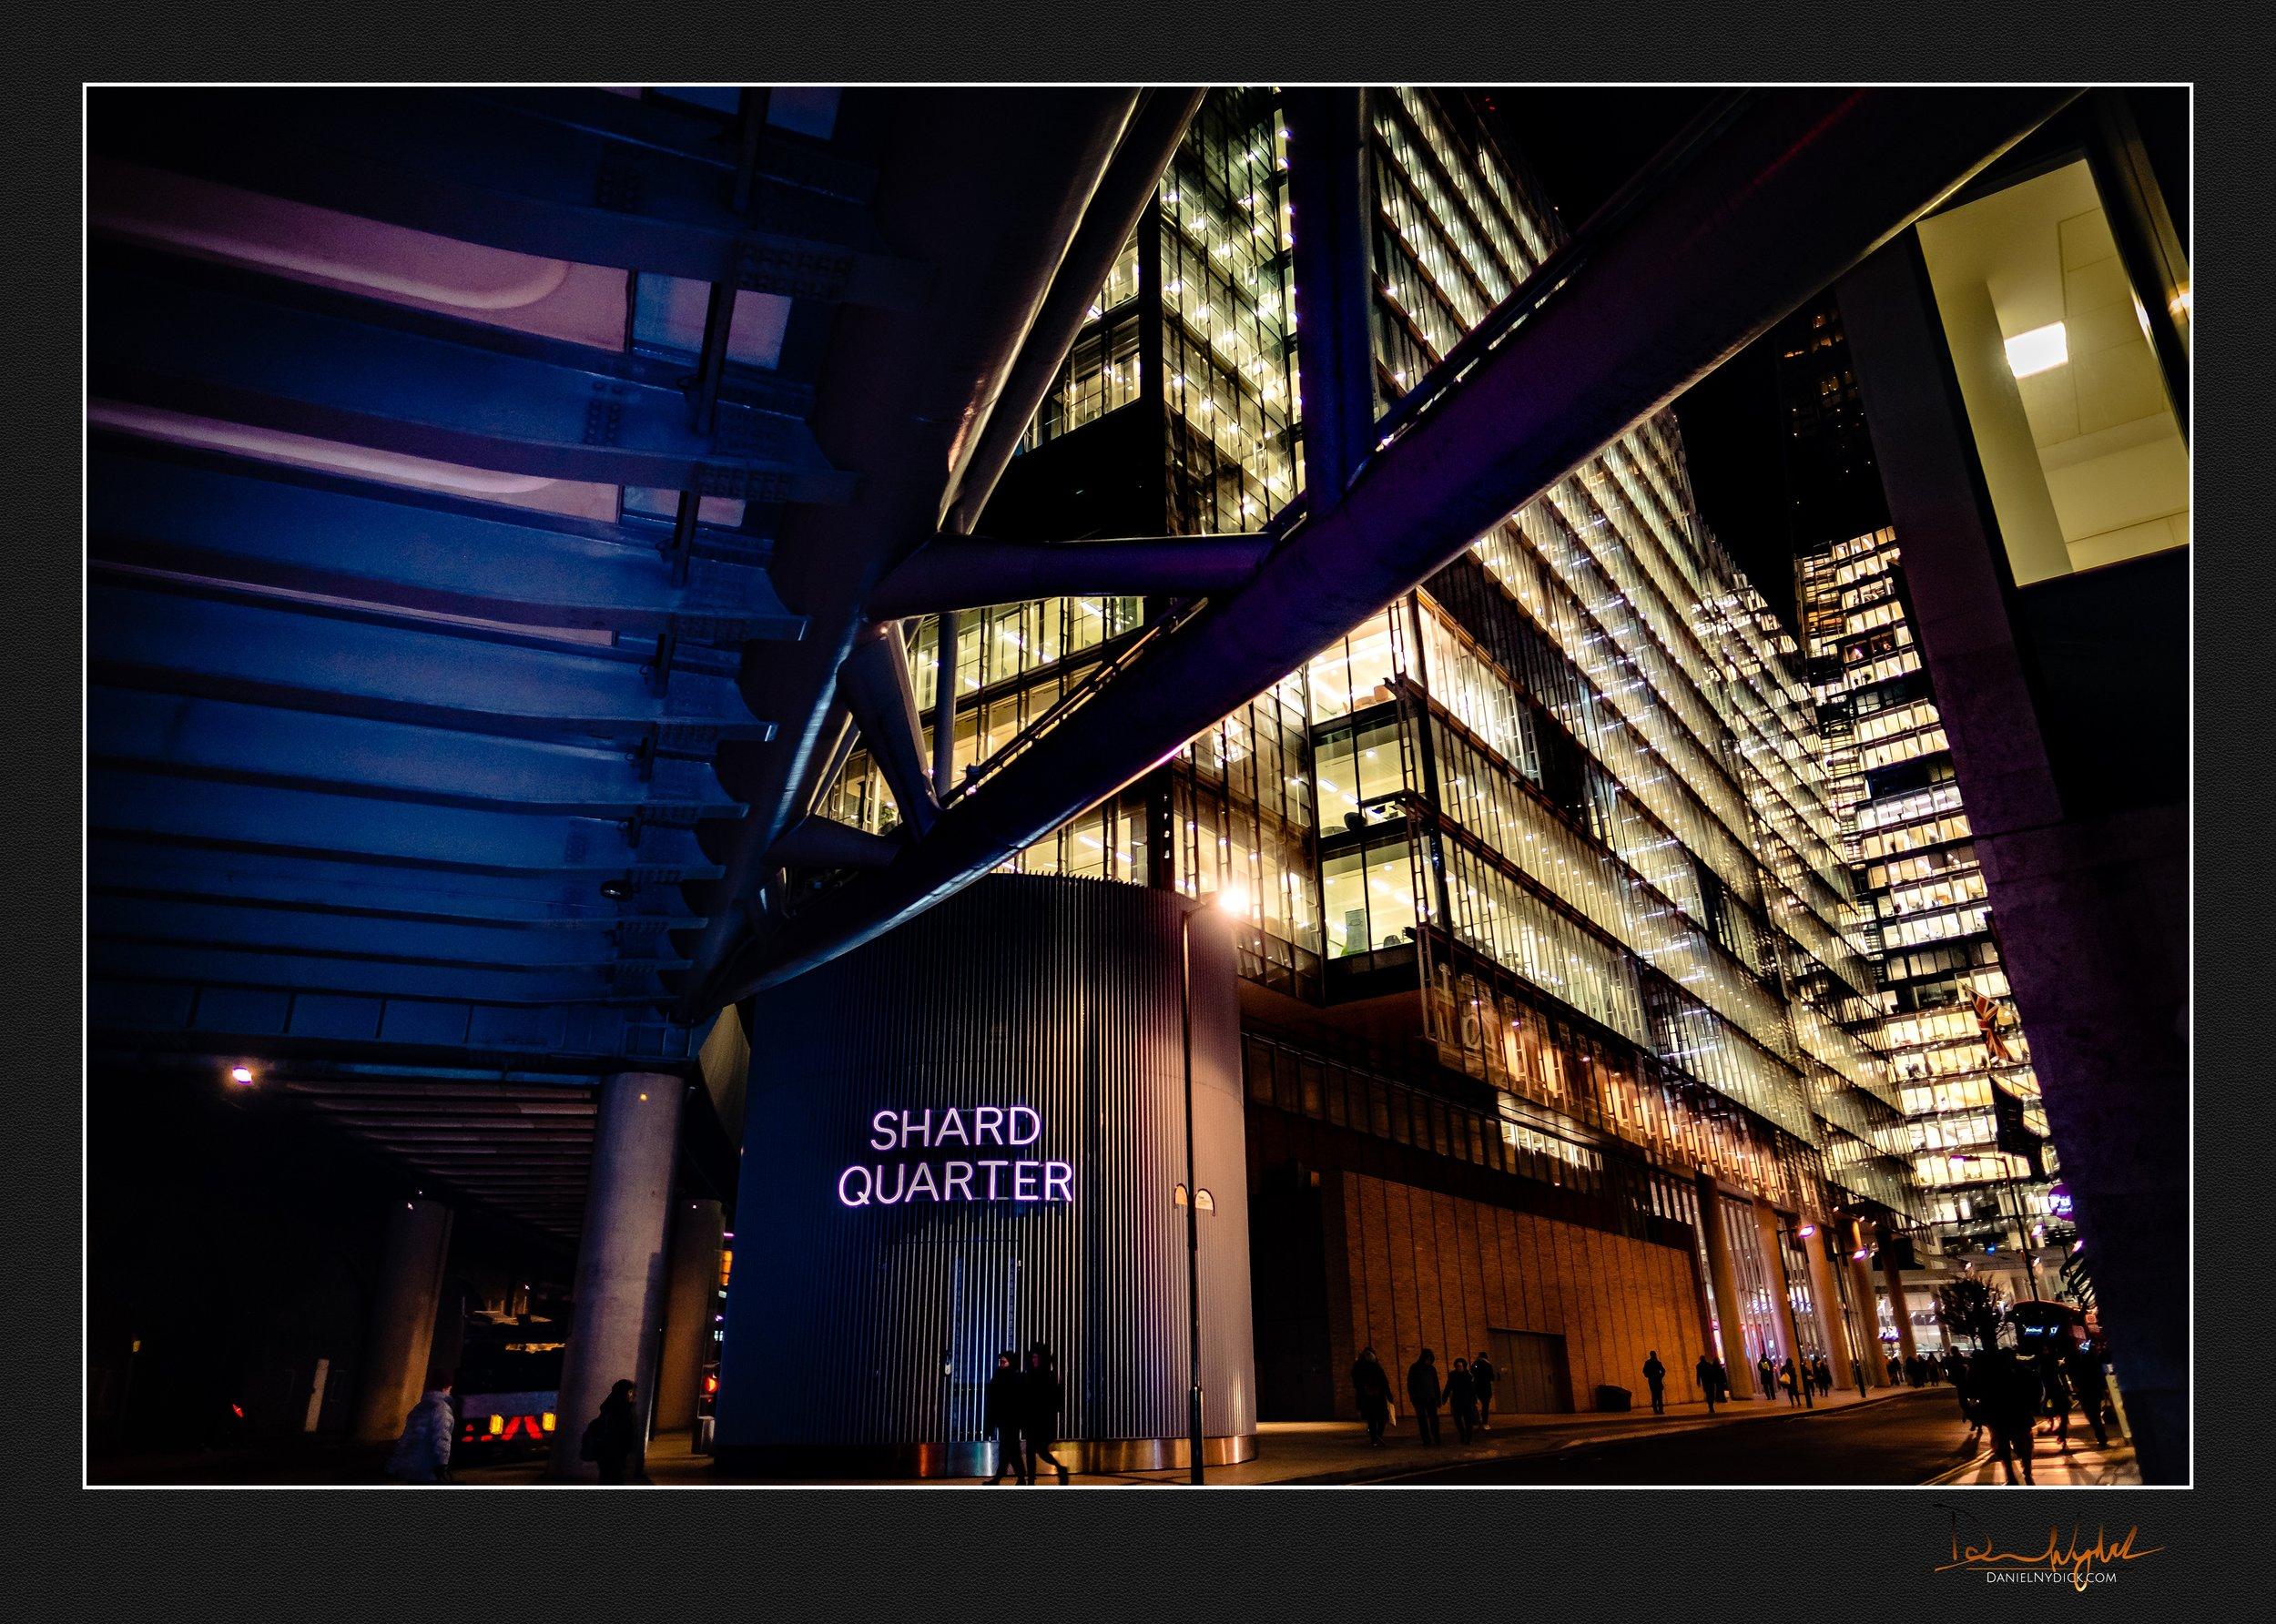 shard quarter, under the bridge, architecture